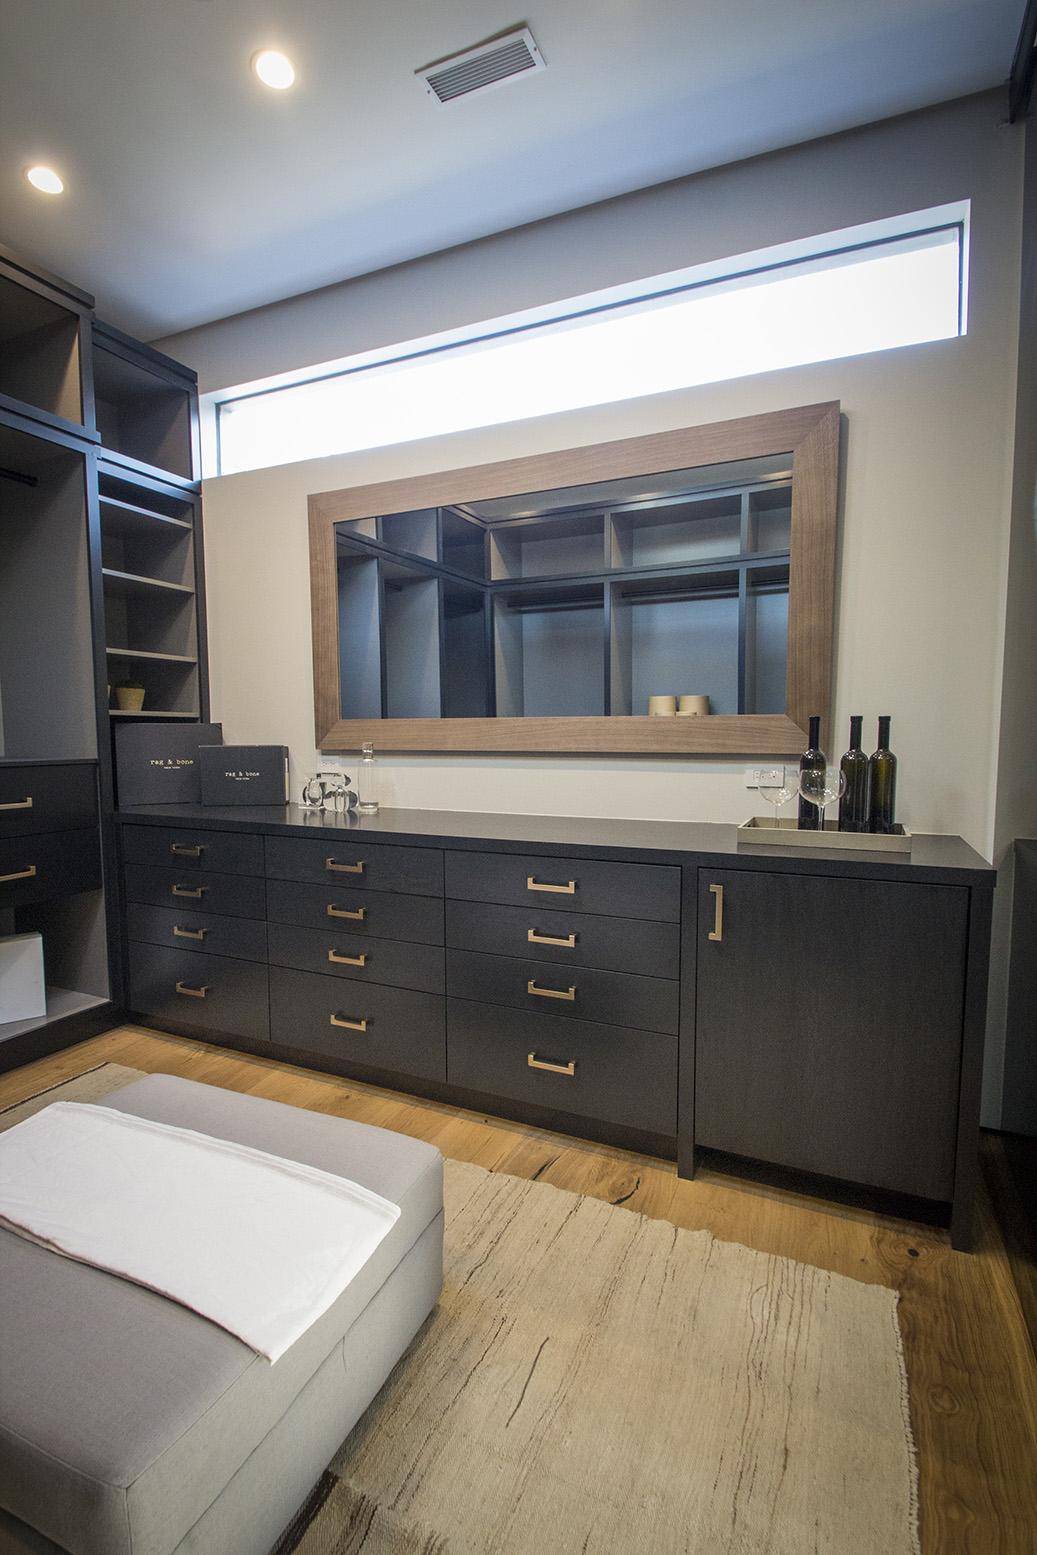 Maryland Drive House - Closet room 1